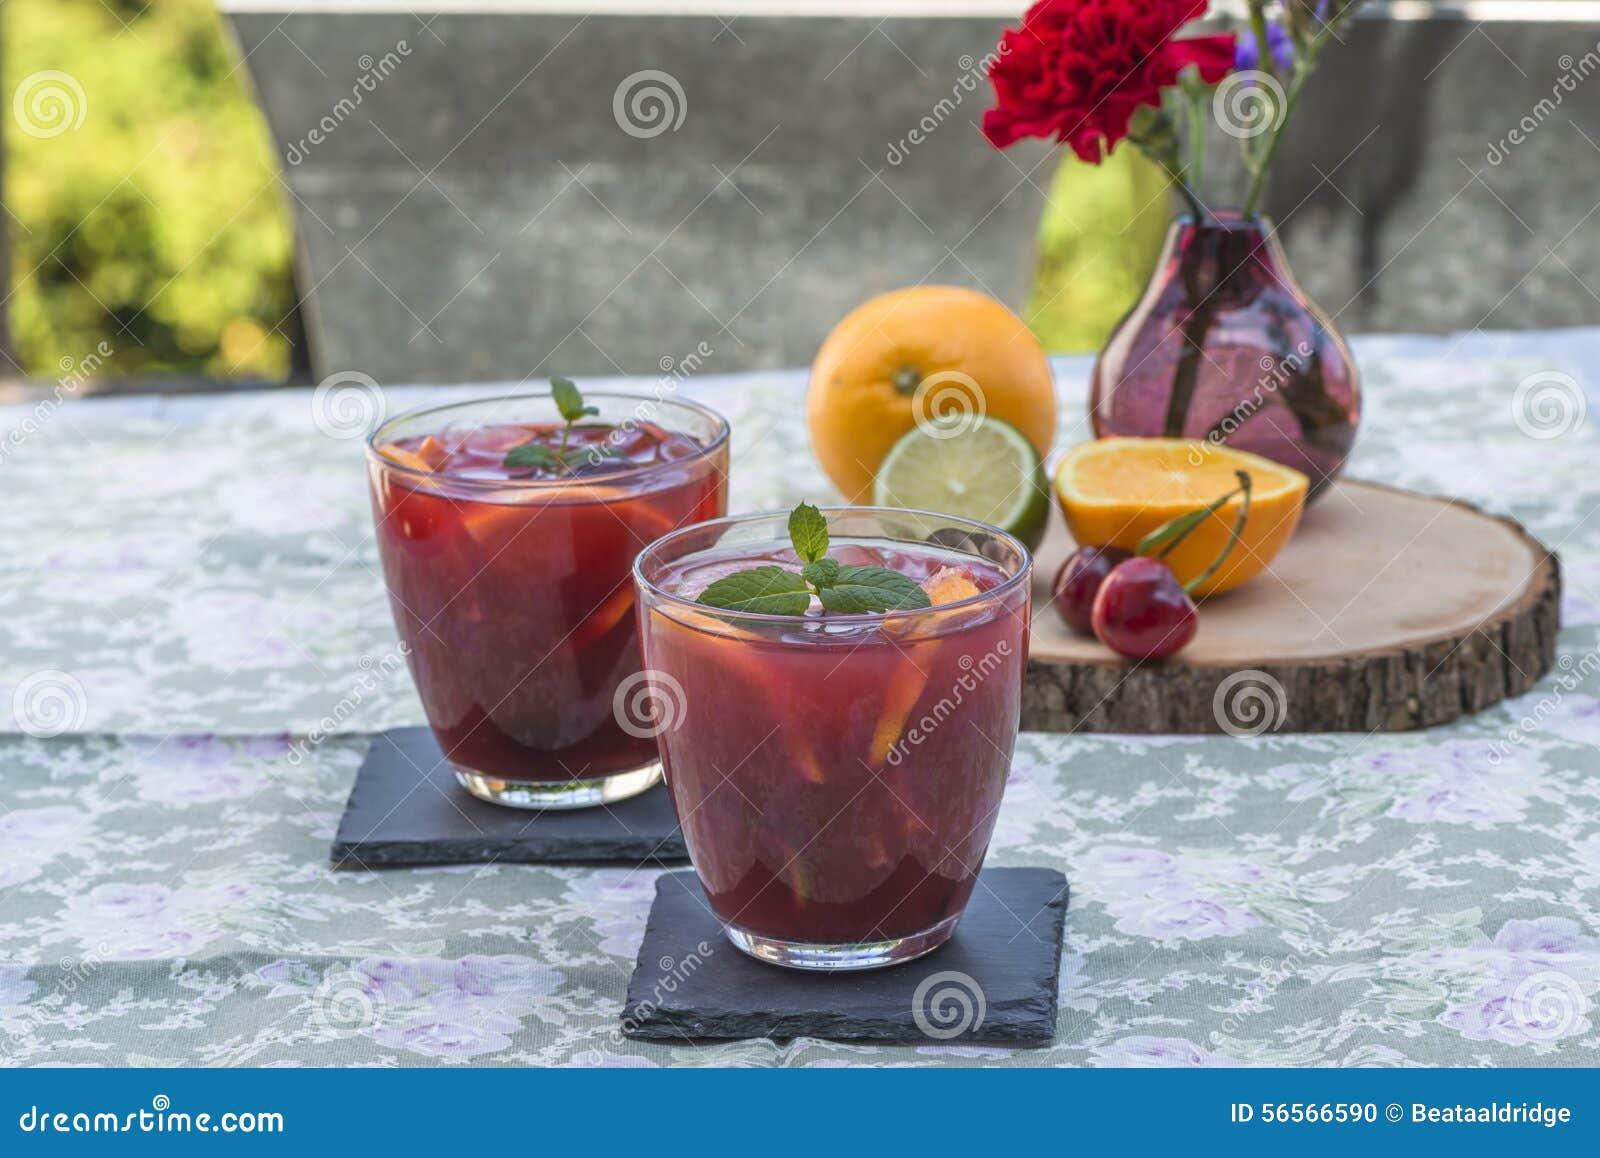 Download κόκκινο sangria στοκ εικόνες. εικόνα από ασβέστης, διακοπές - 56566590